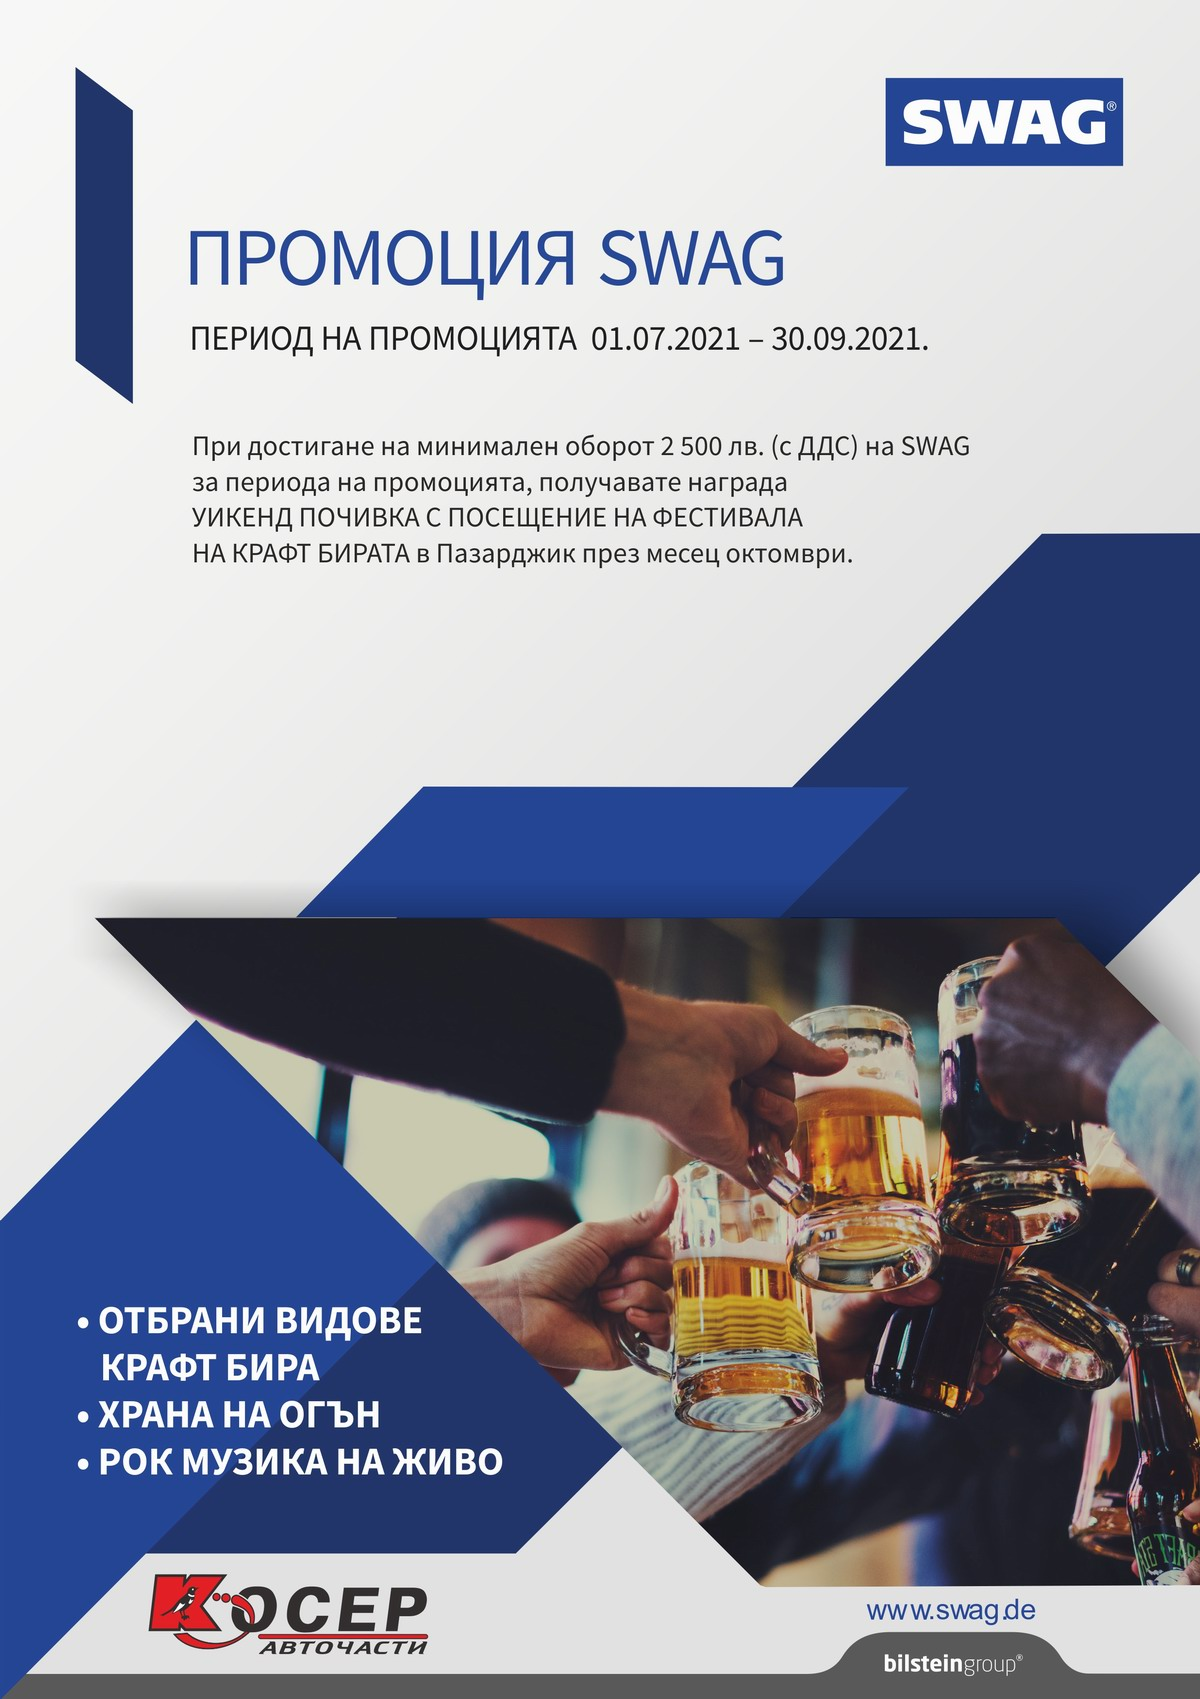 Промоция SWAG - 01.07.2021 до 30.09.2021